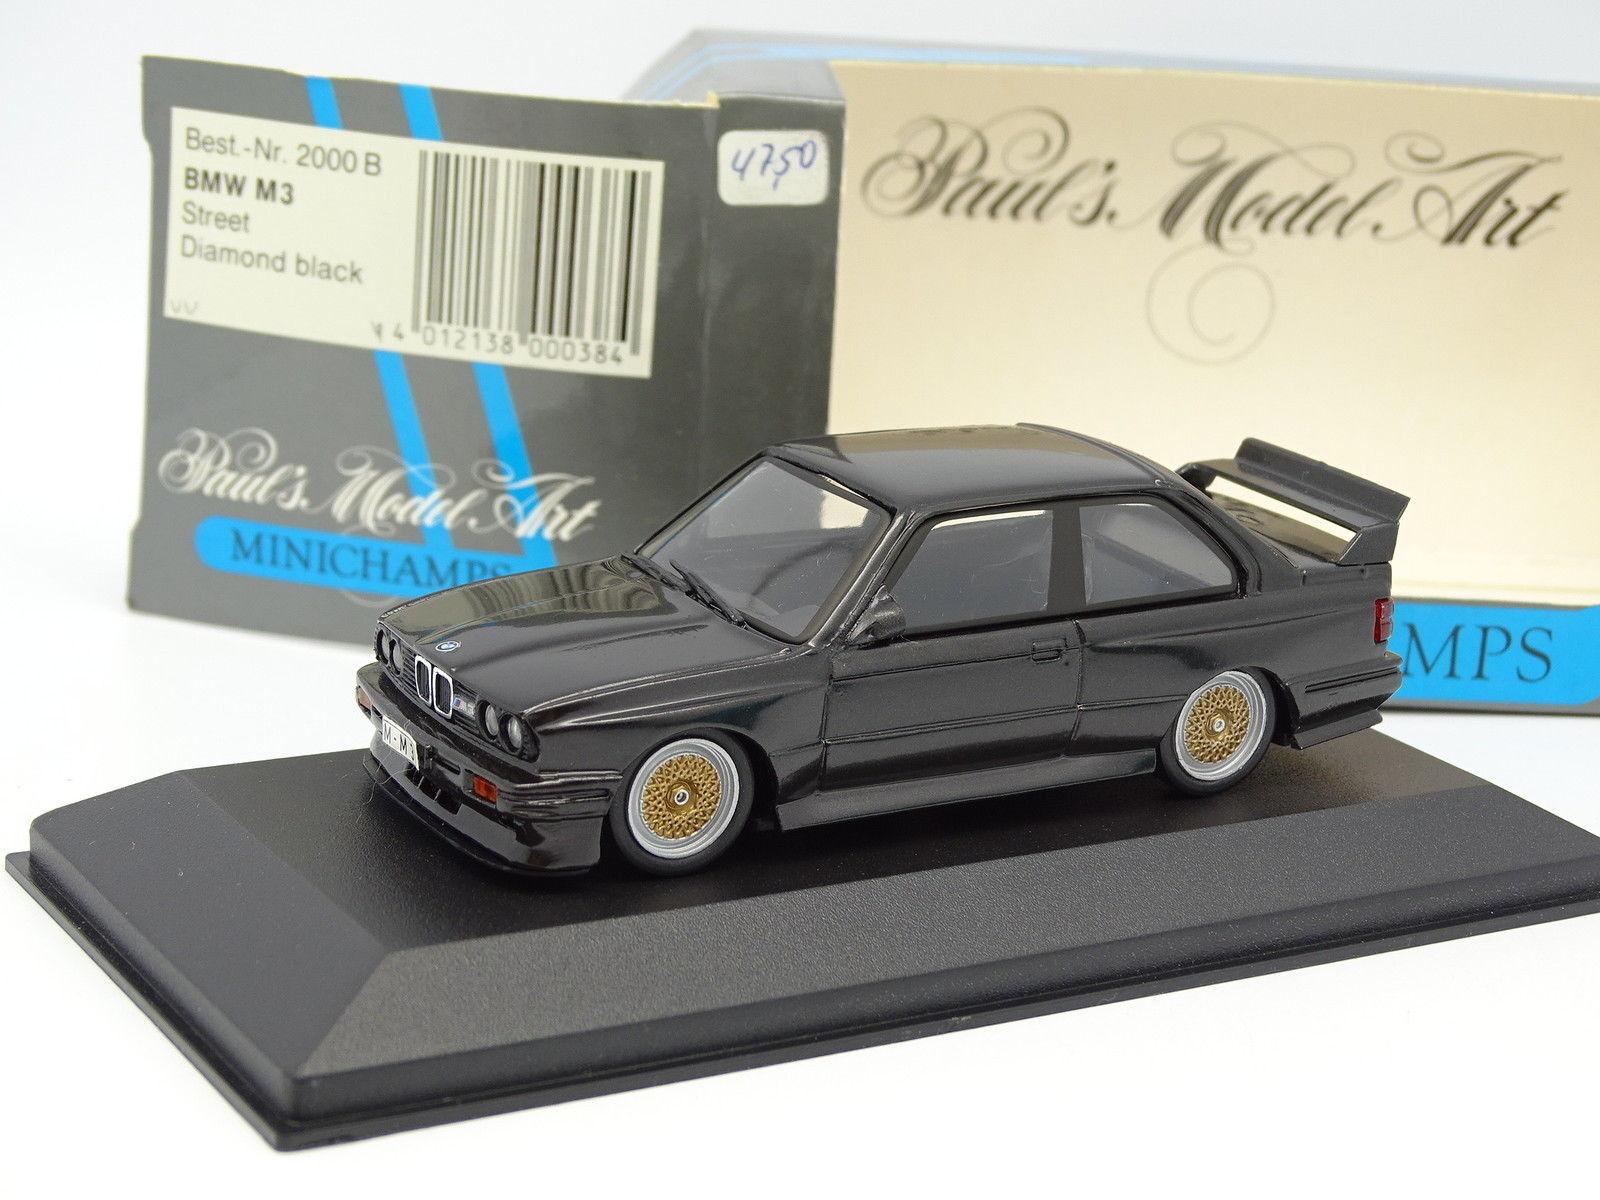 Minichamps 1 43 - BMW M3 E30 Diamond negro